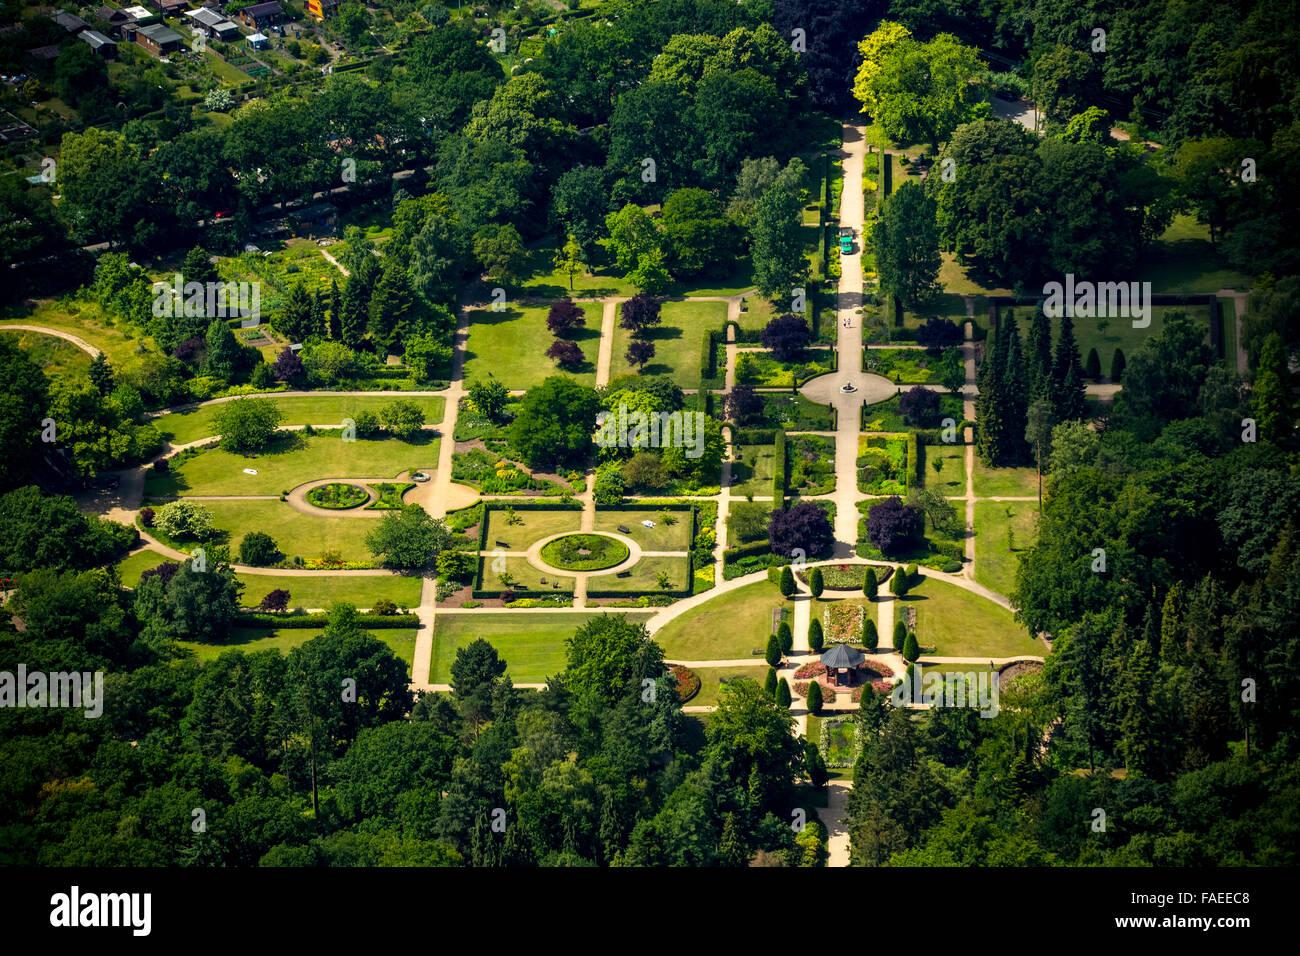 Aerial view, Volkspark Hamburg, Volkspark Altona, Hamburg, Free and Hanseatic City of Hamburg, Hamburg, Germany, - Stock Image